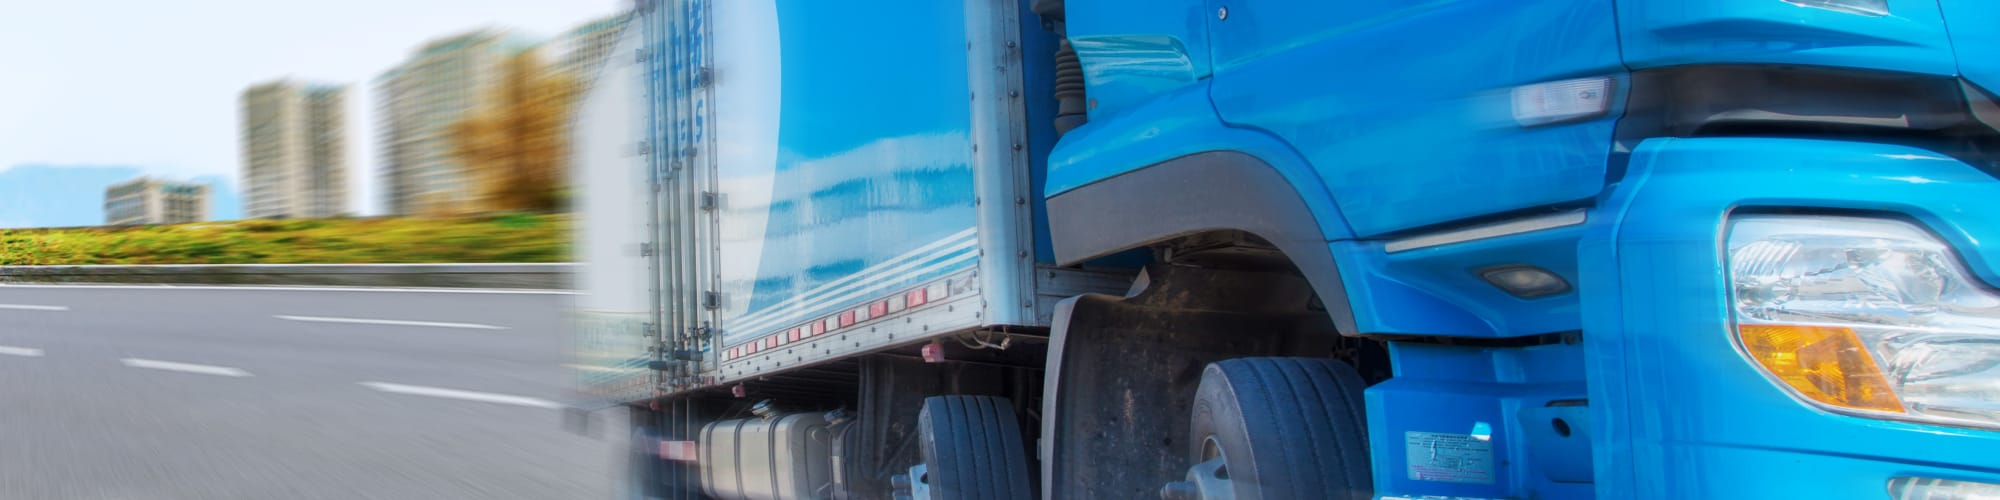 Truck Rentals at Nest Self Storage in Salem, Oregon